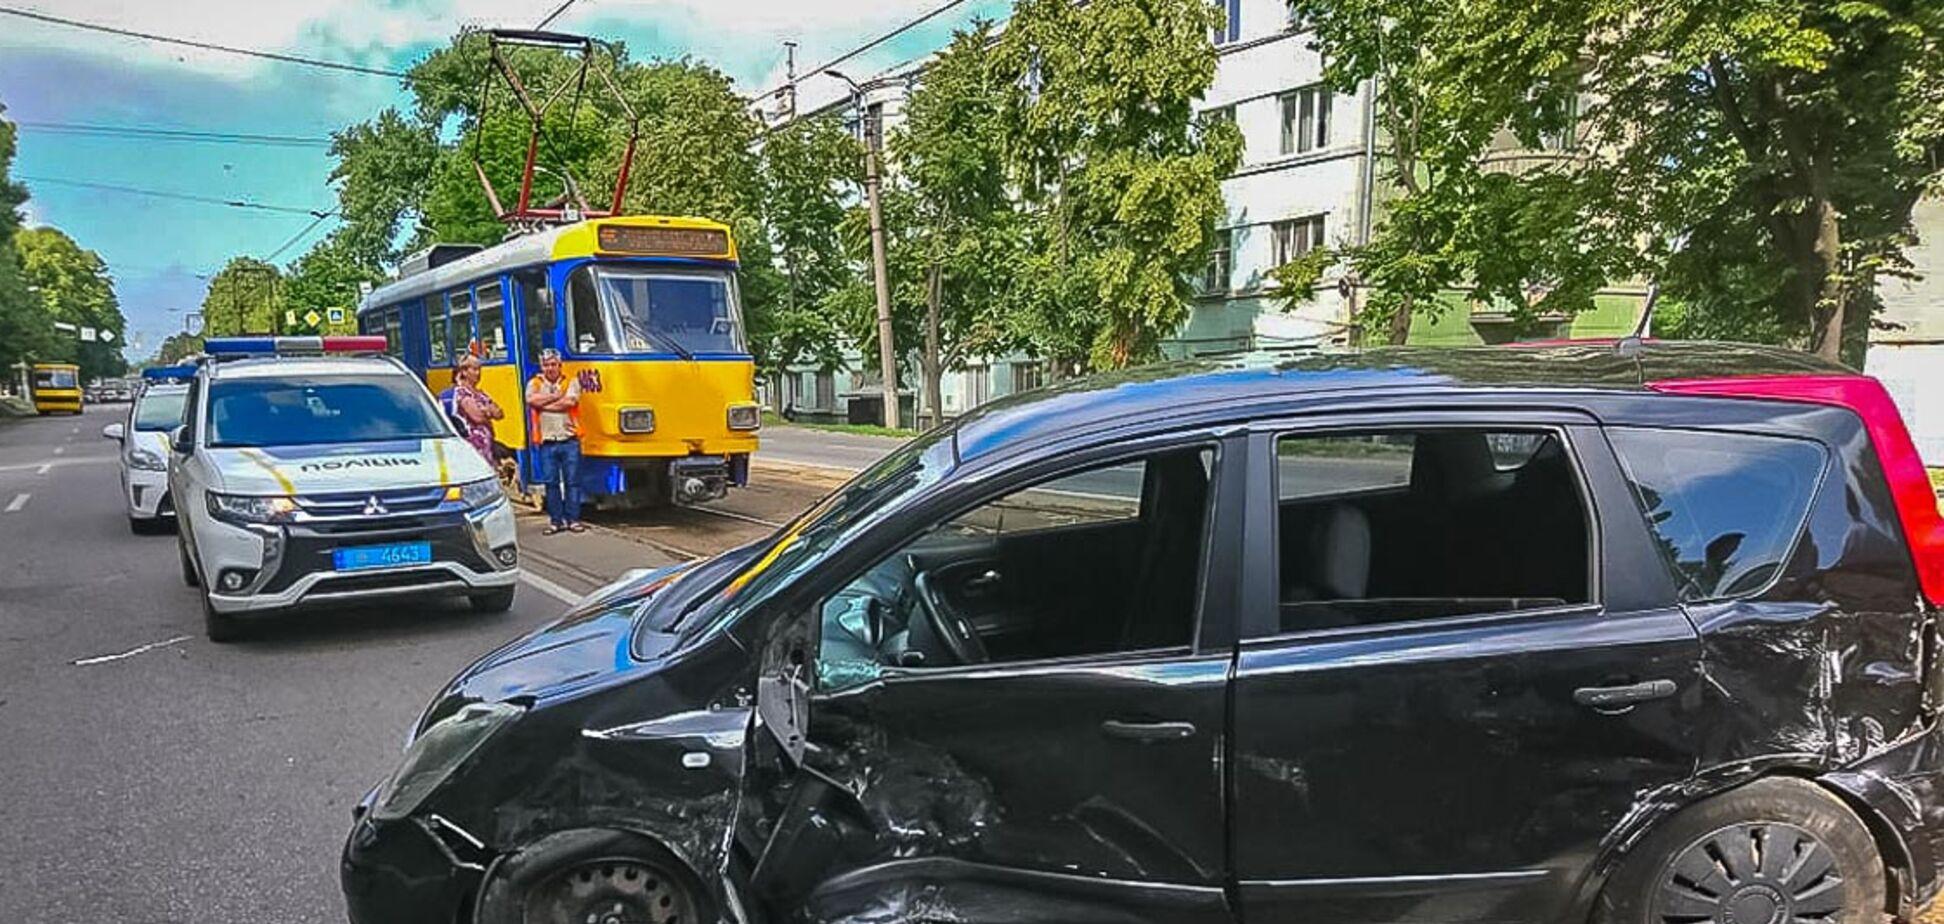 В Днепре в результате столкновения легковушек пострадал мужчина. Фото с места аварии